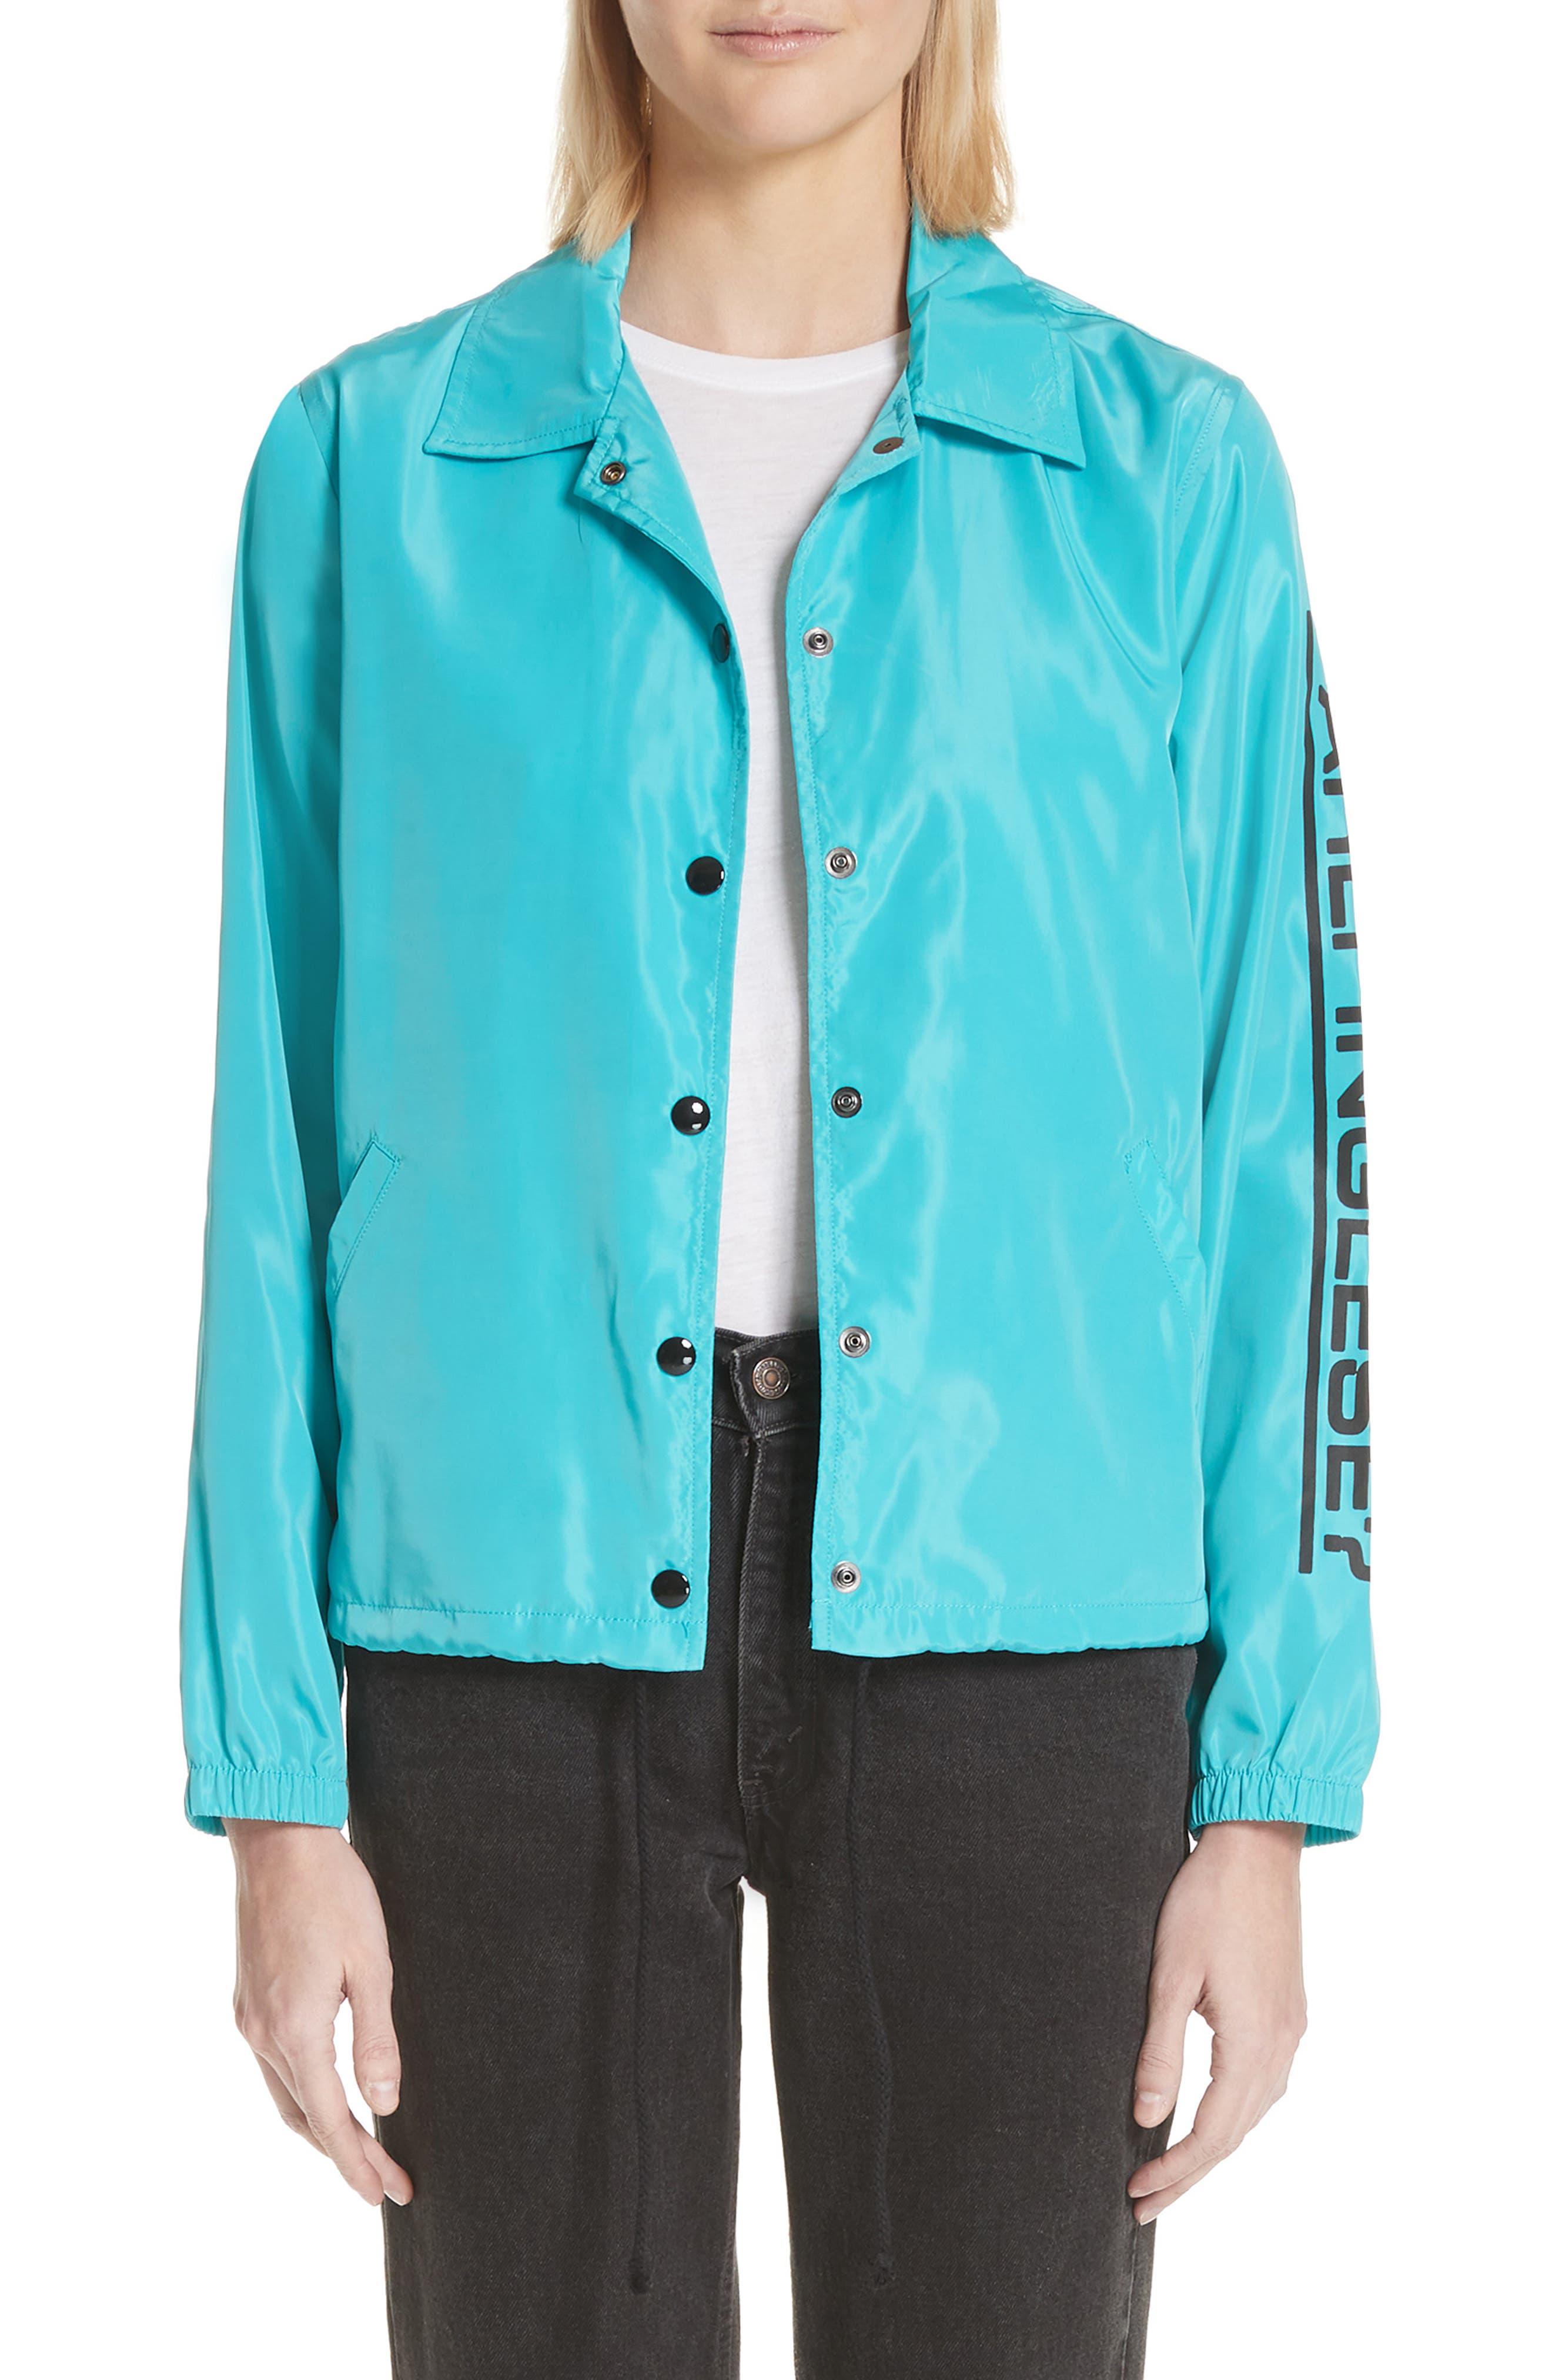 Parli Inglese Coach Jacket,                             Main thumbnail 1, color,                             Turquoise